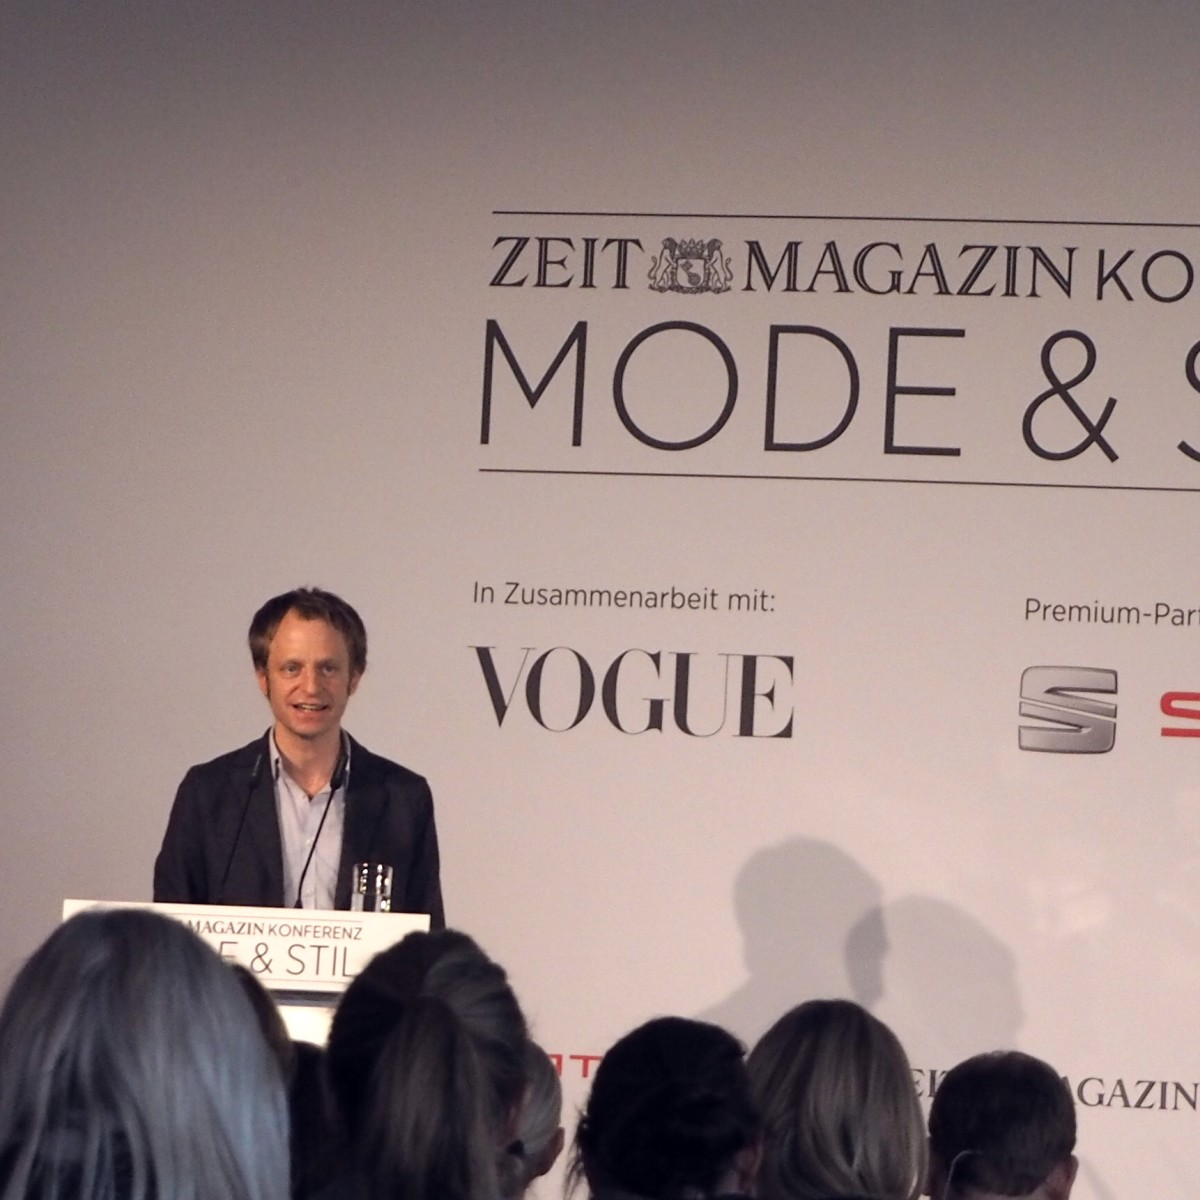 ZEITmagazin Konferenz